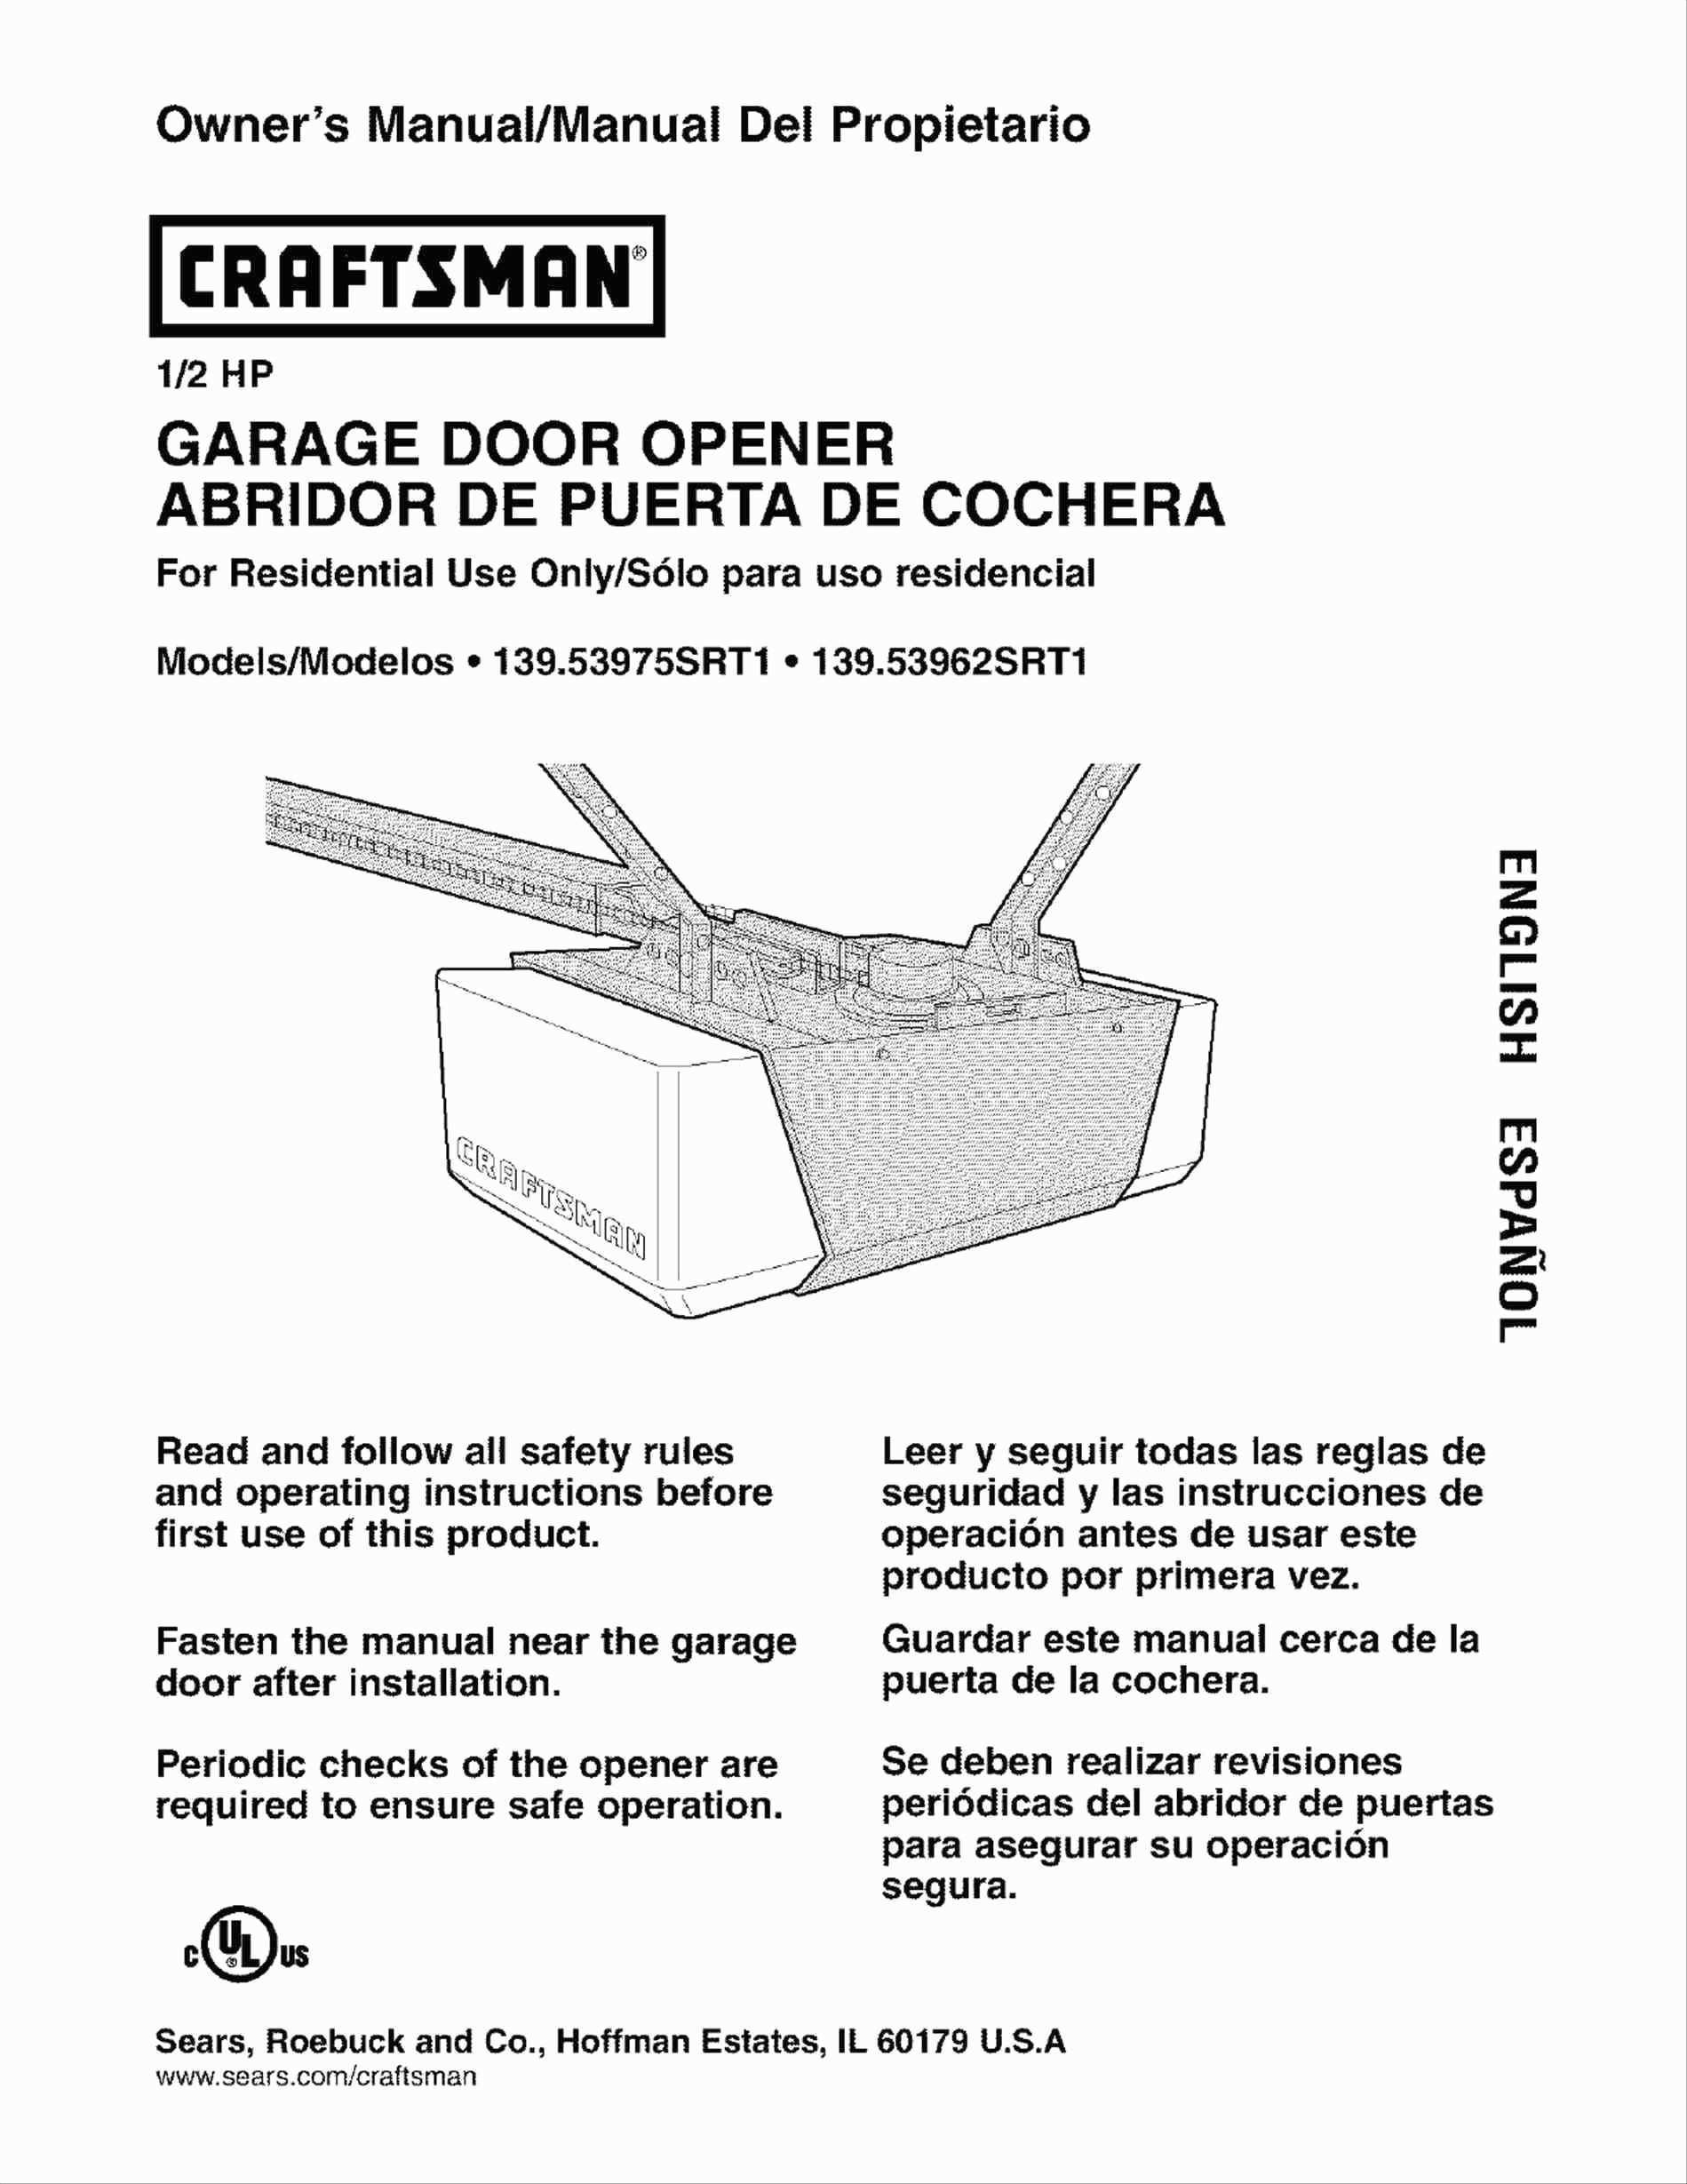 Chamberlain Garage Door Openers Manual 1 2 Hp